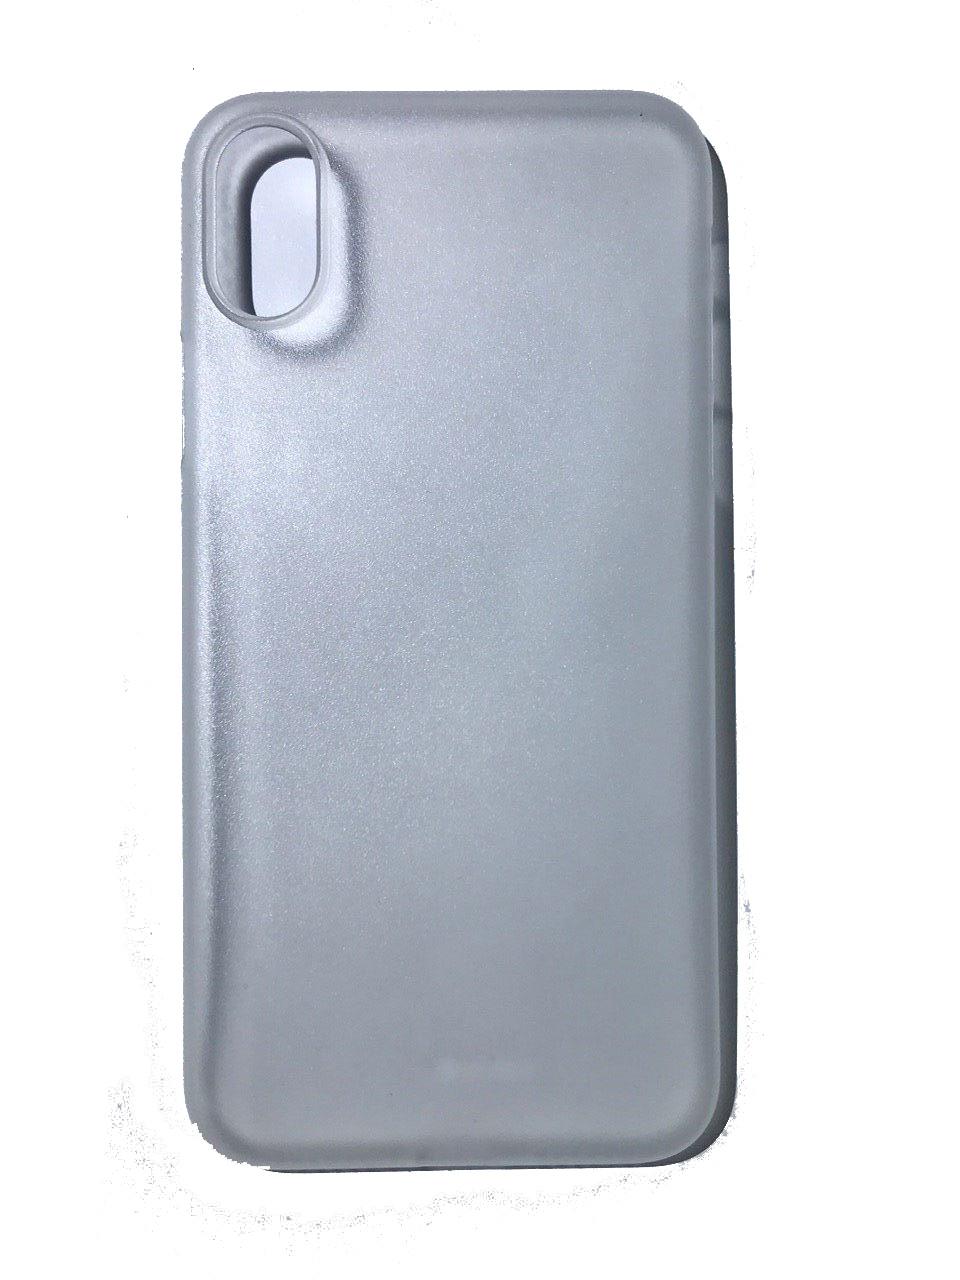 Чехол для сотового телефона Benks Чехол for iPhone X пластик (White), белый glare free screen protector with cleaning cloth for iphone 3g